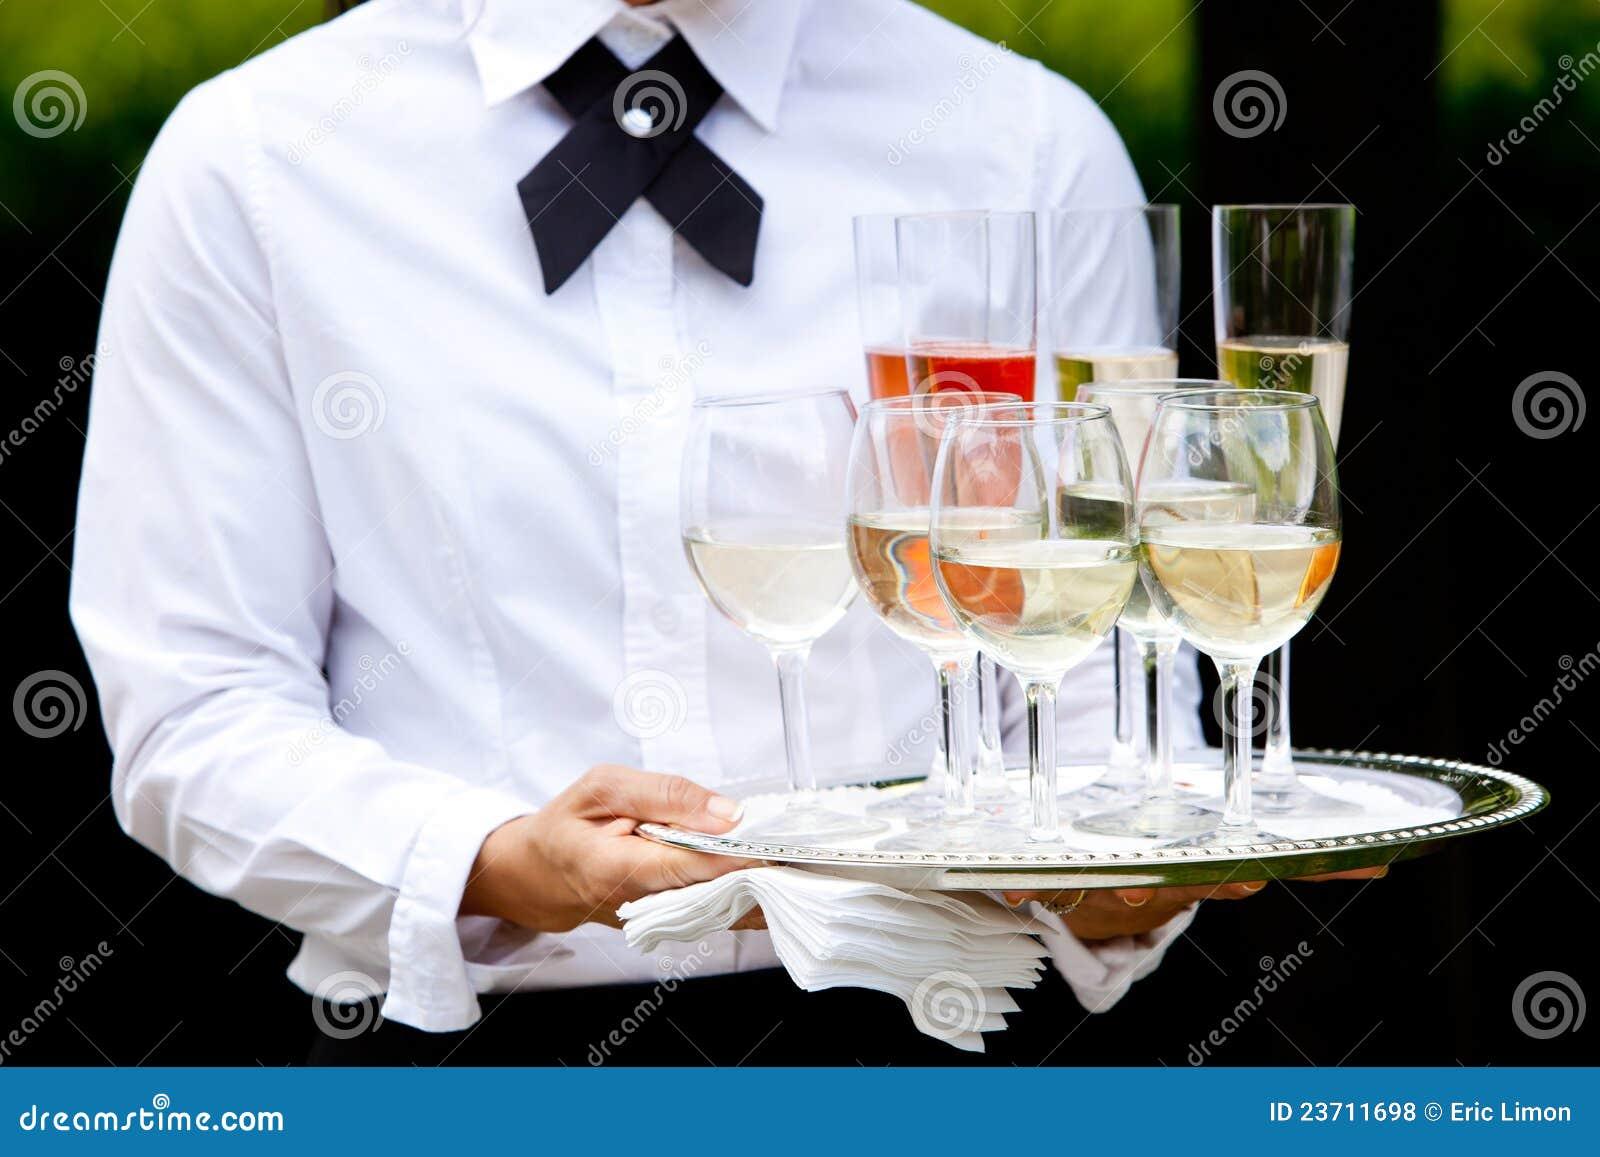 Waiter serving drinks - wedding series